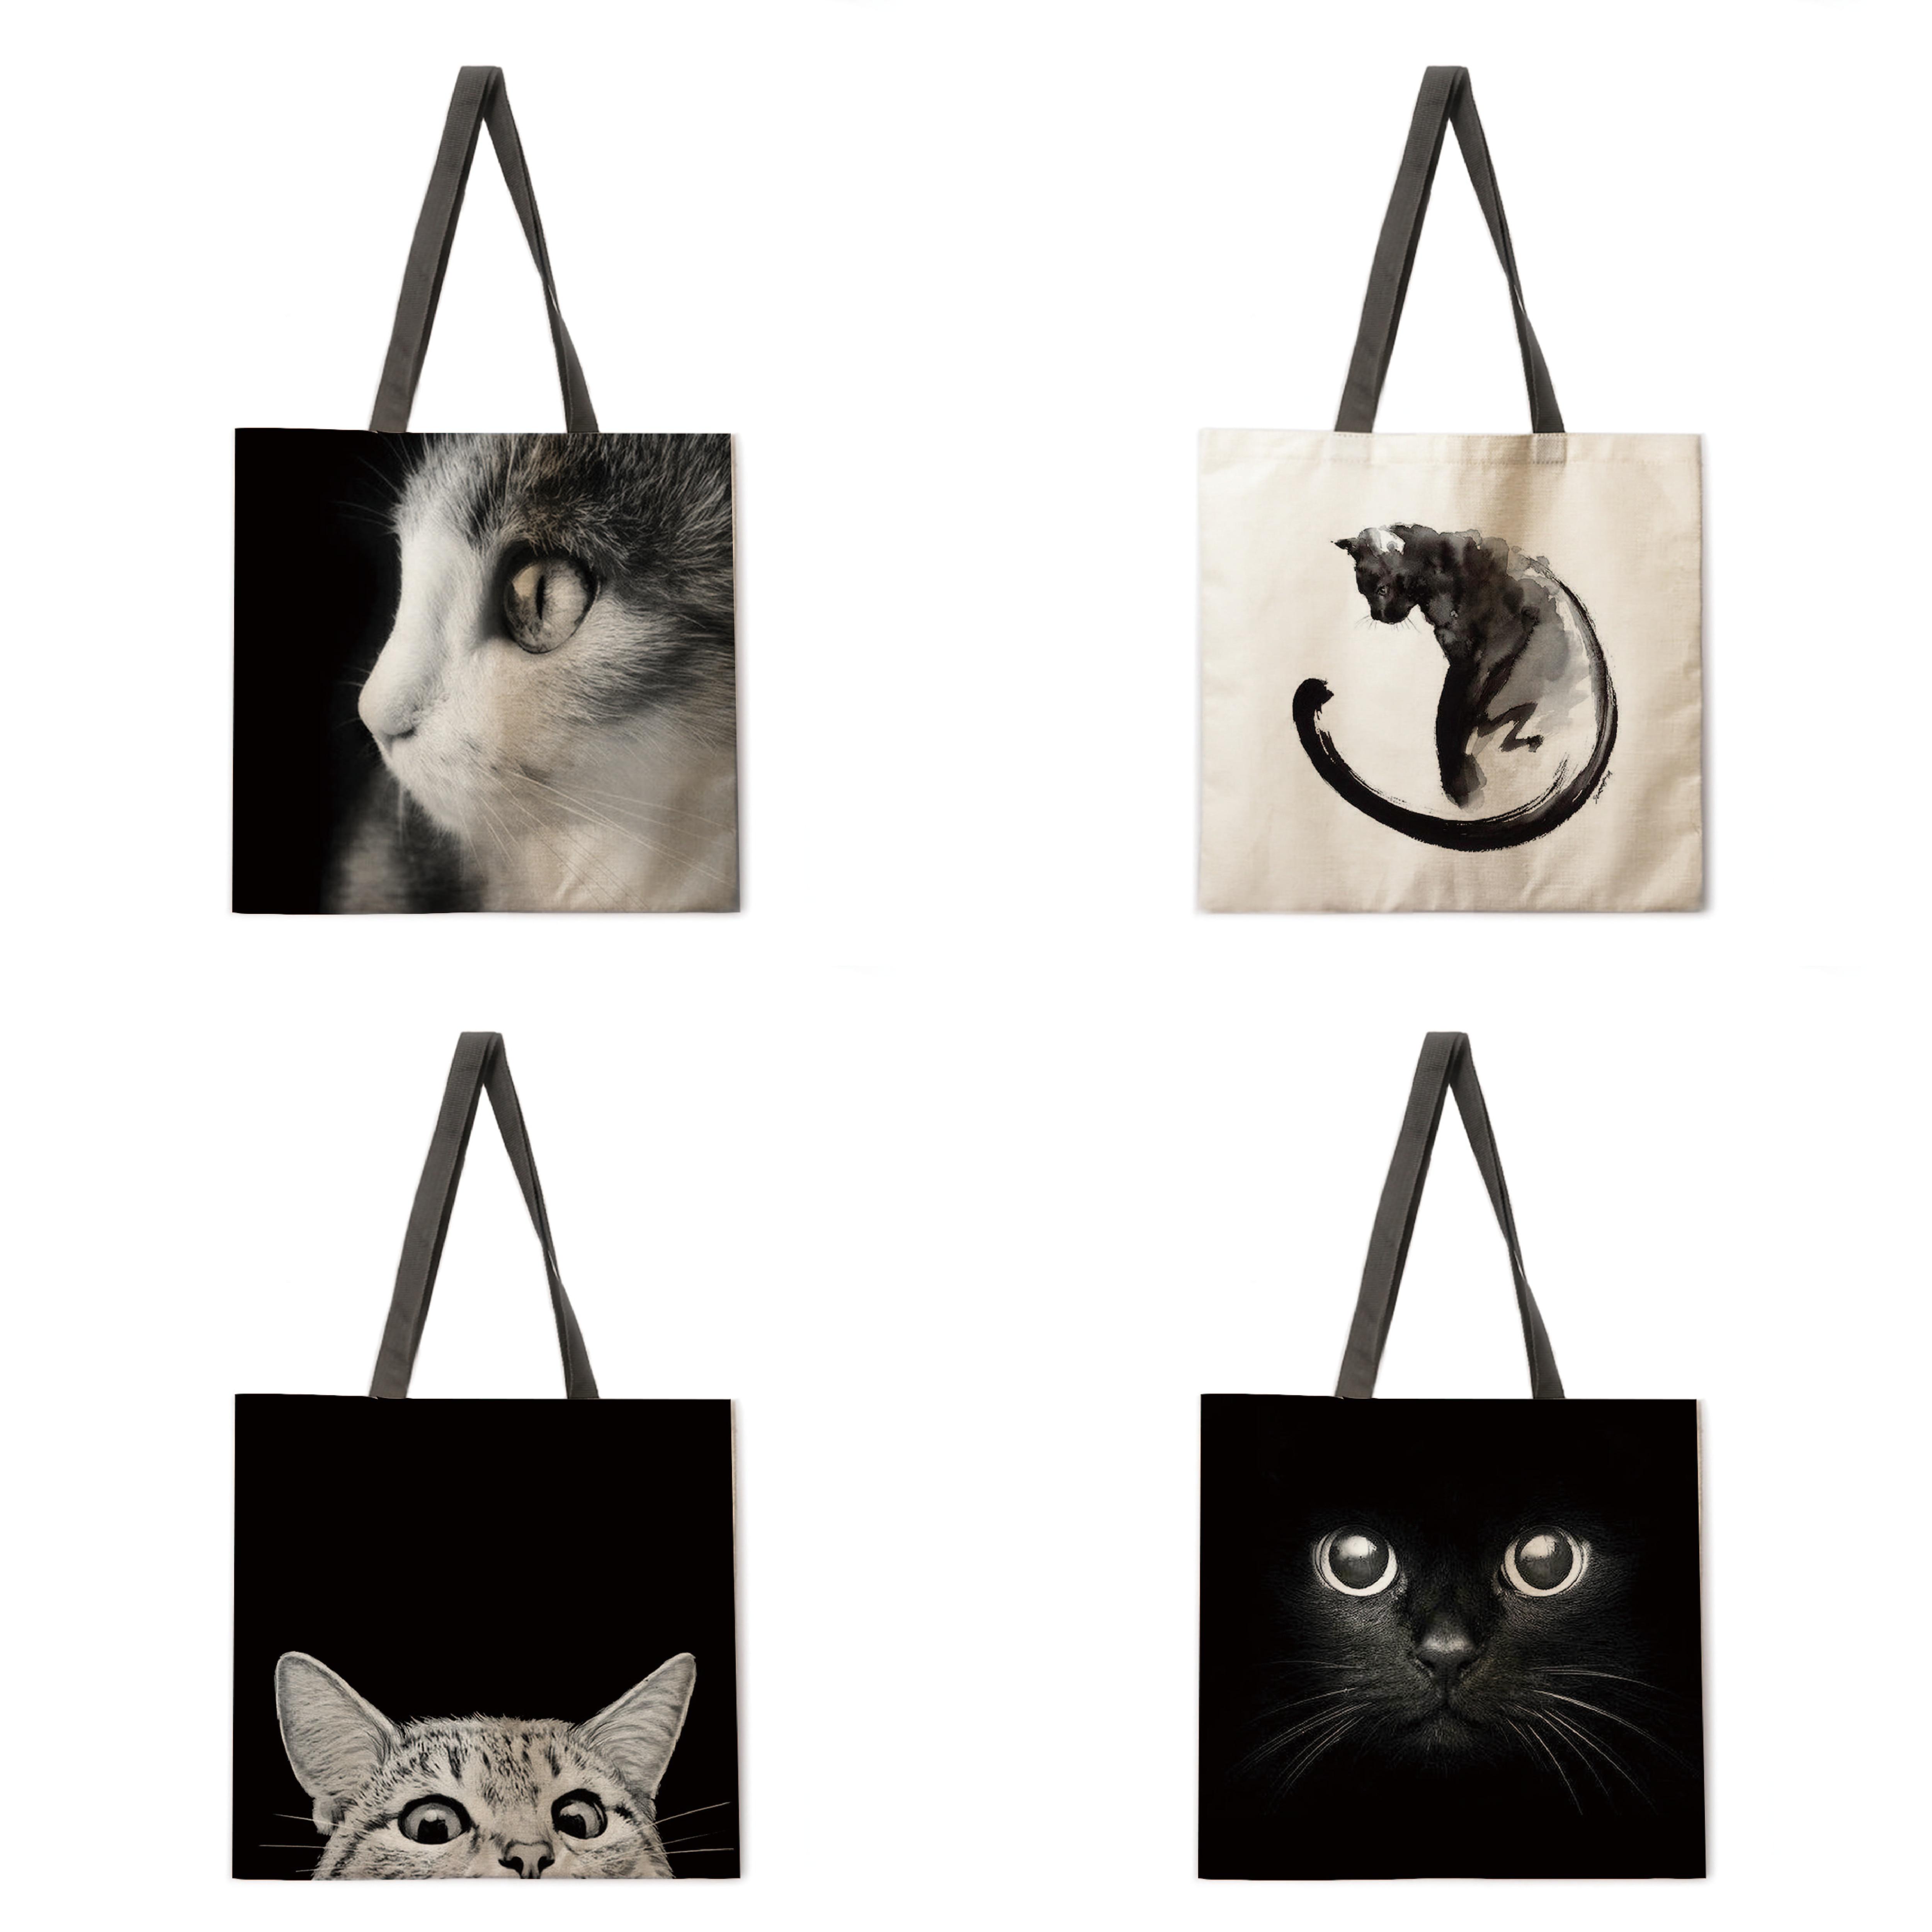 AliExpress - Foldable shopping bag black cat handbag lady shoulder bag lady leisure handbag outdoor beach handbag